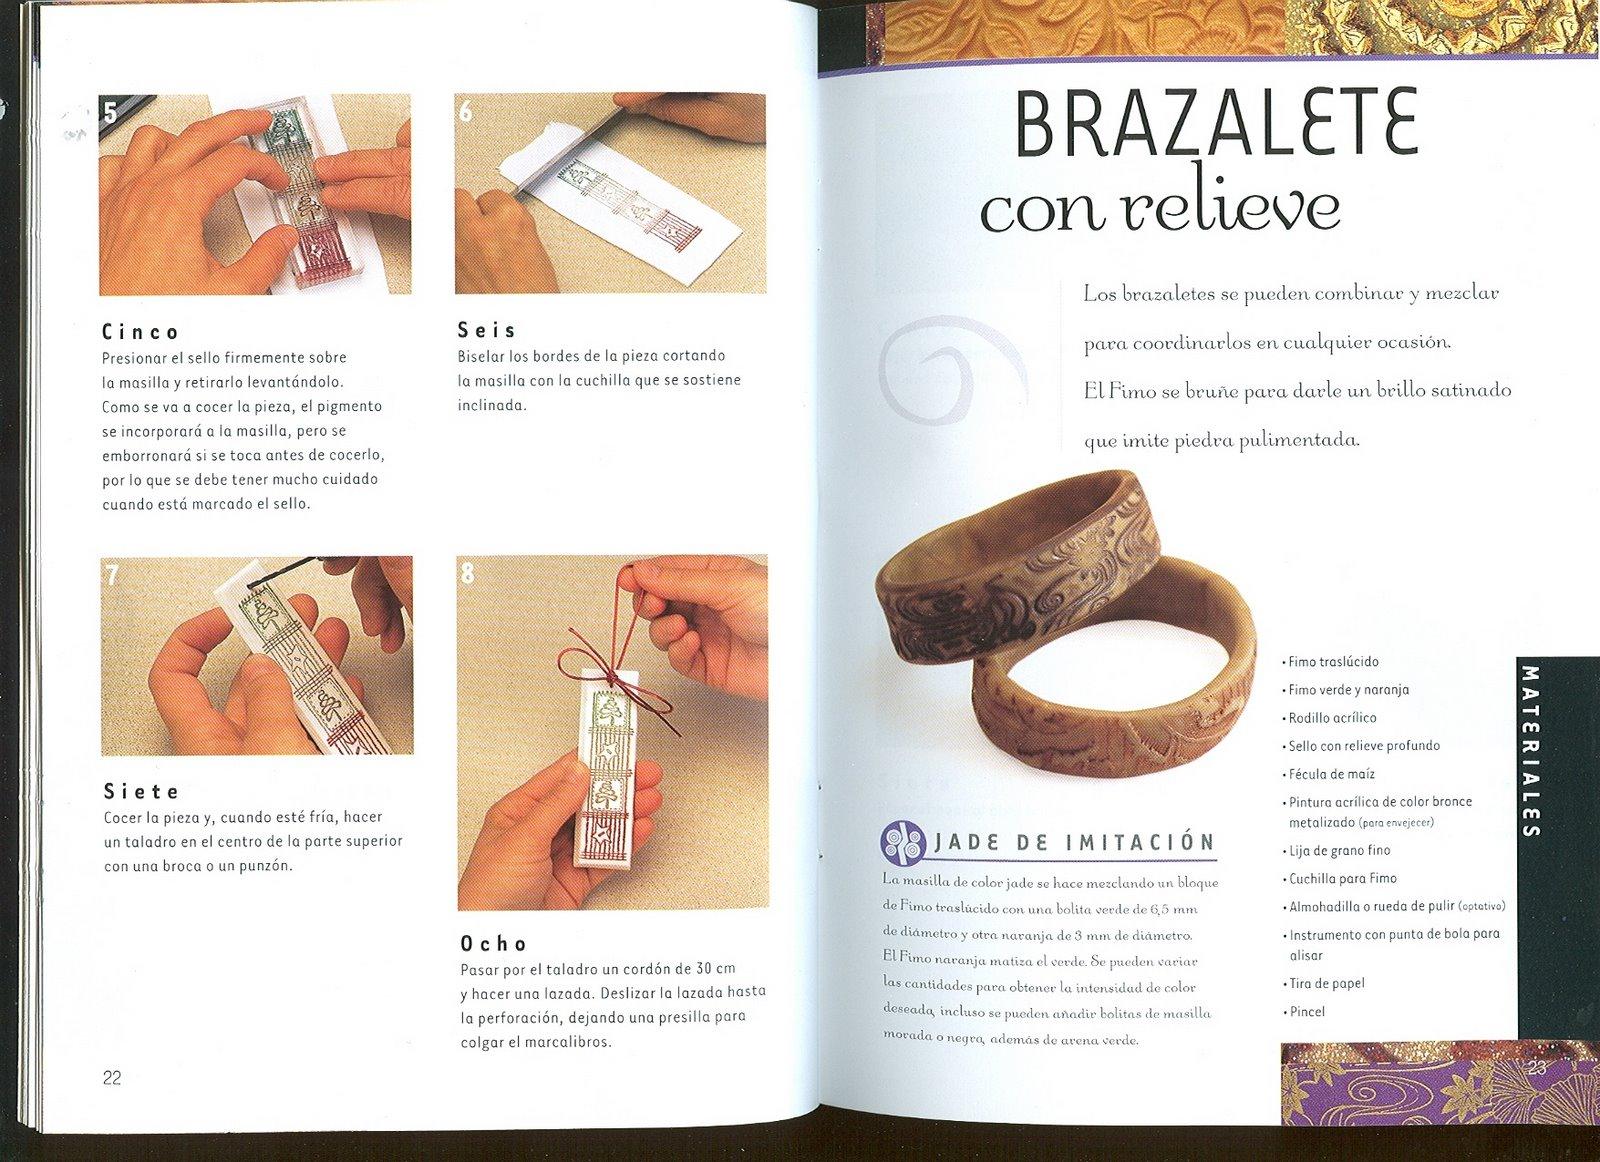 Fimo la t cnica de estampar fimo variasmanualidades 39 s blog for Tecnicas gastronomicas pdf